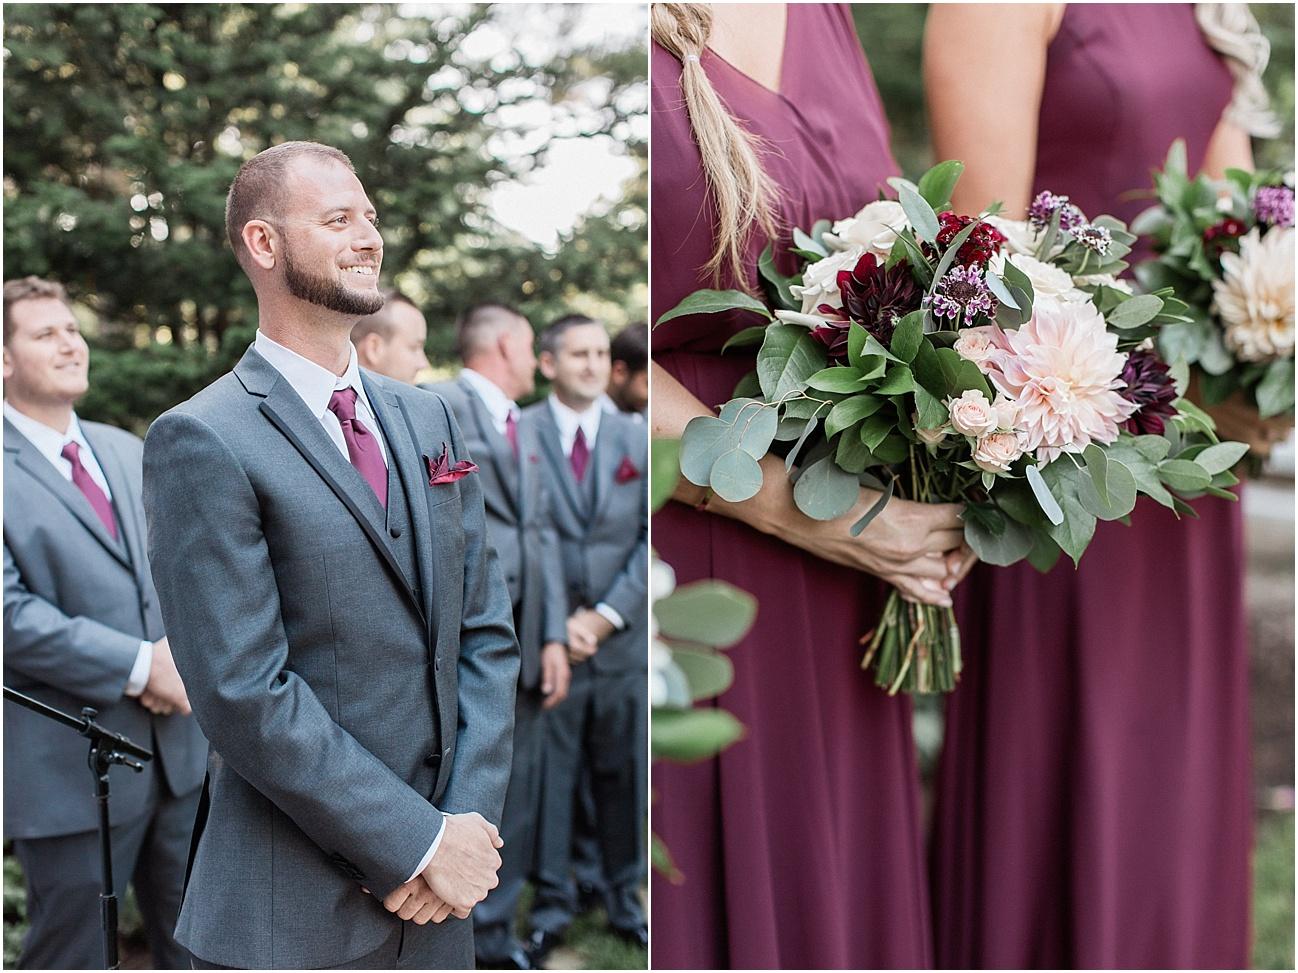 christina_frank_the_pavilion_at_pine_hills_fall_wine_cape_cod_boston_wedding_photographer_meredith_jane_photography_photo_1233.jpg